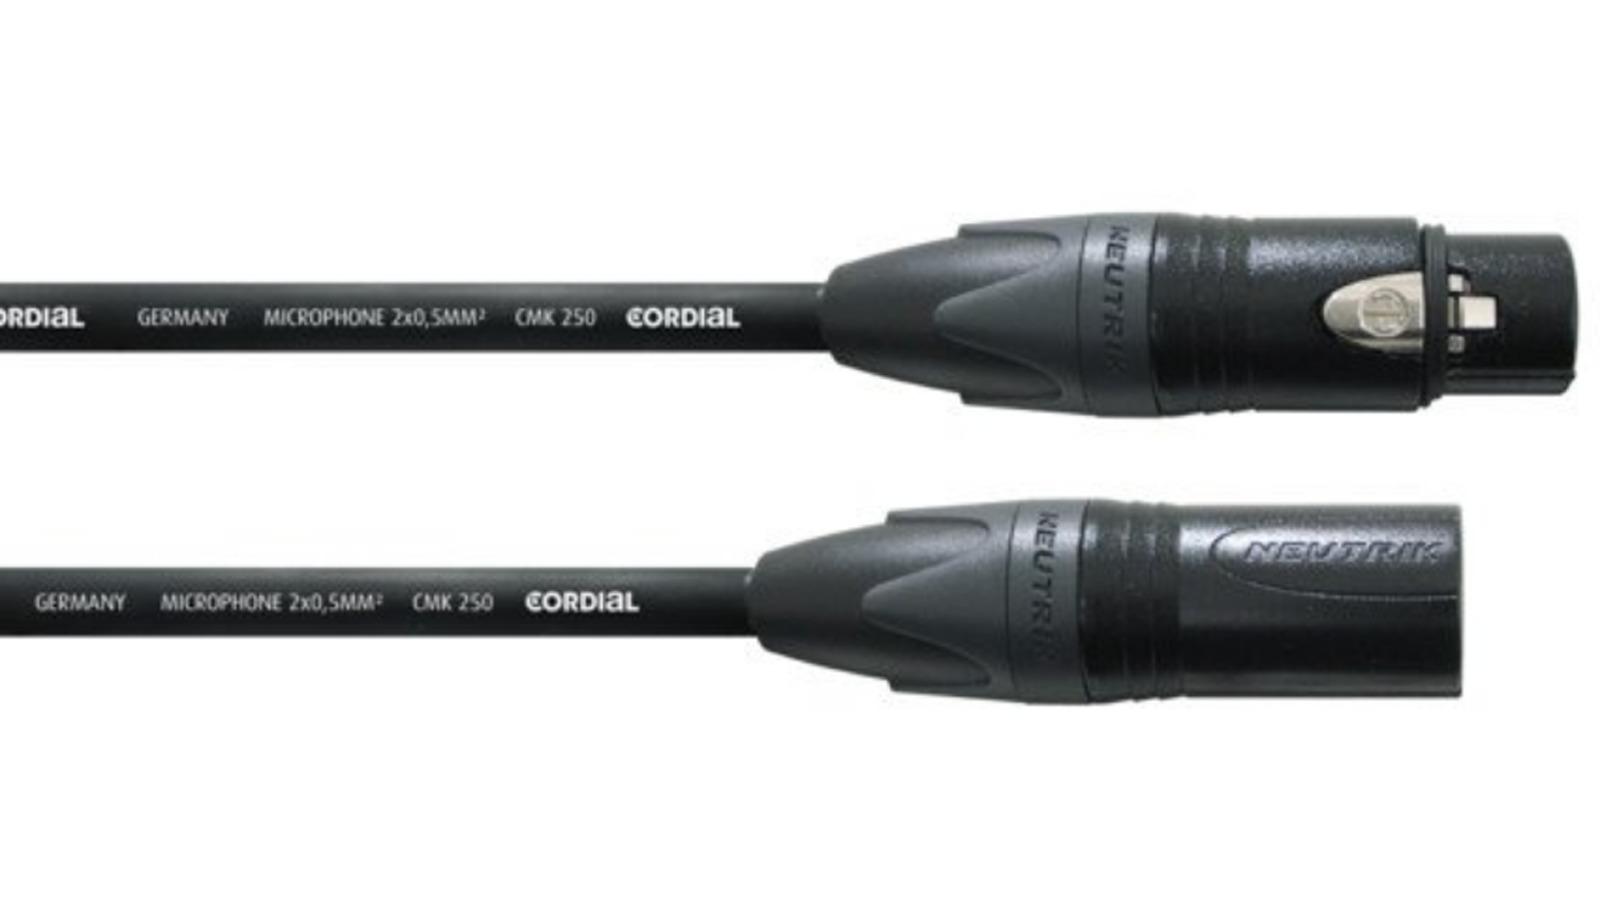 Cordial CSM 2,5 FM Gold 250 Mikrofon Kabel Studio 2,5 m